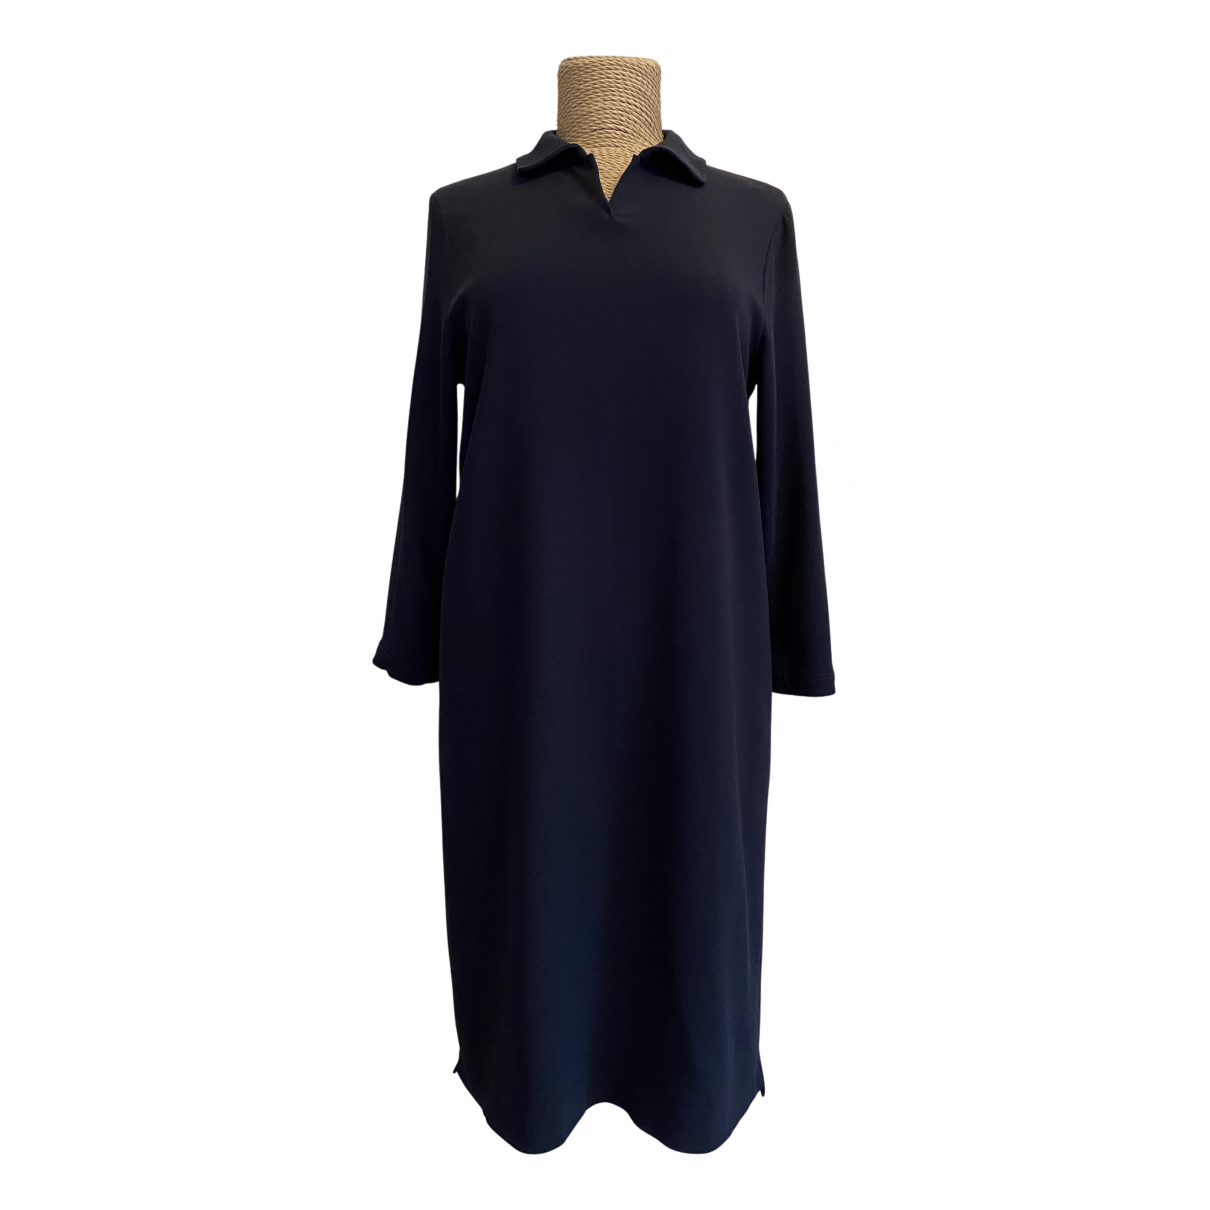 Max Mara 's N Navy dress for Women 44 IT